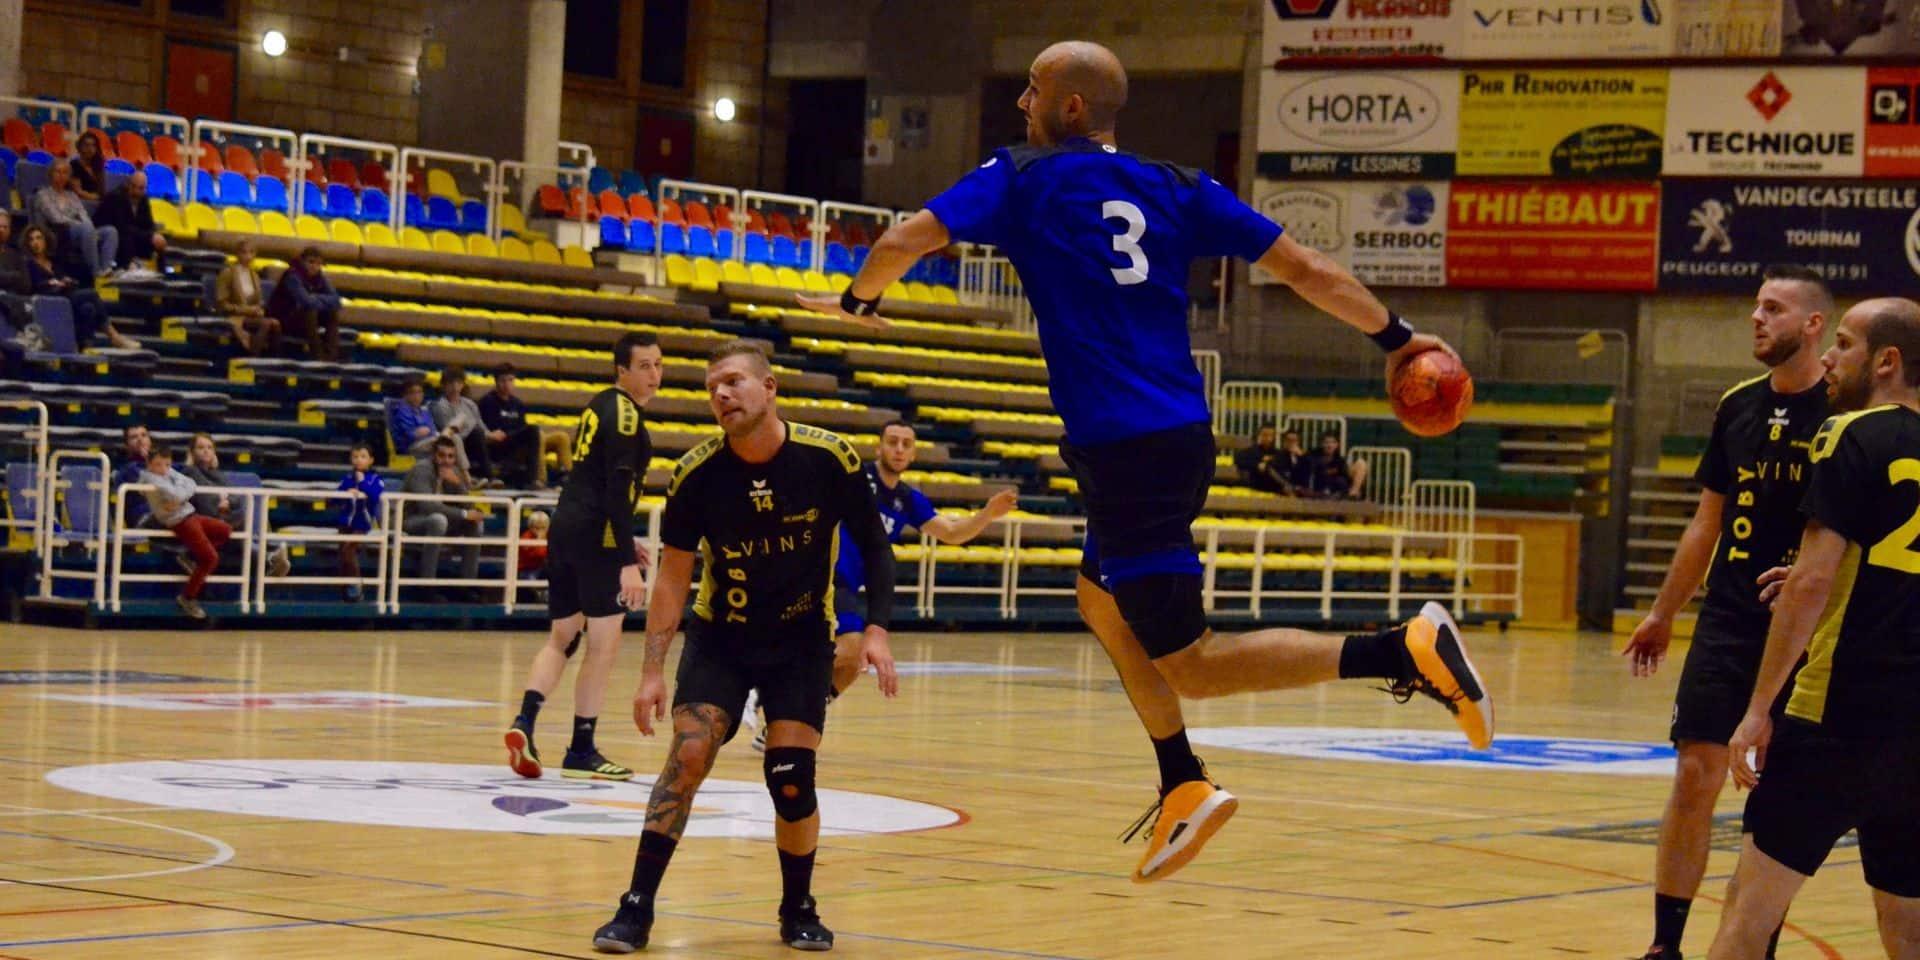 Handball: l'Estu joue un bon tour contre Herstal (+3) : 40-23